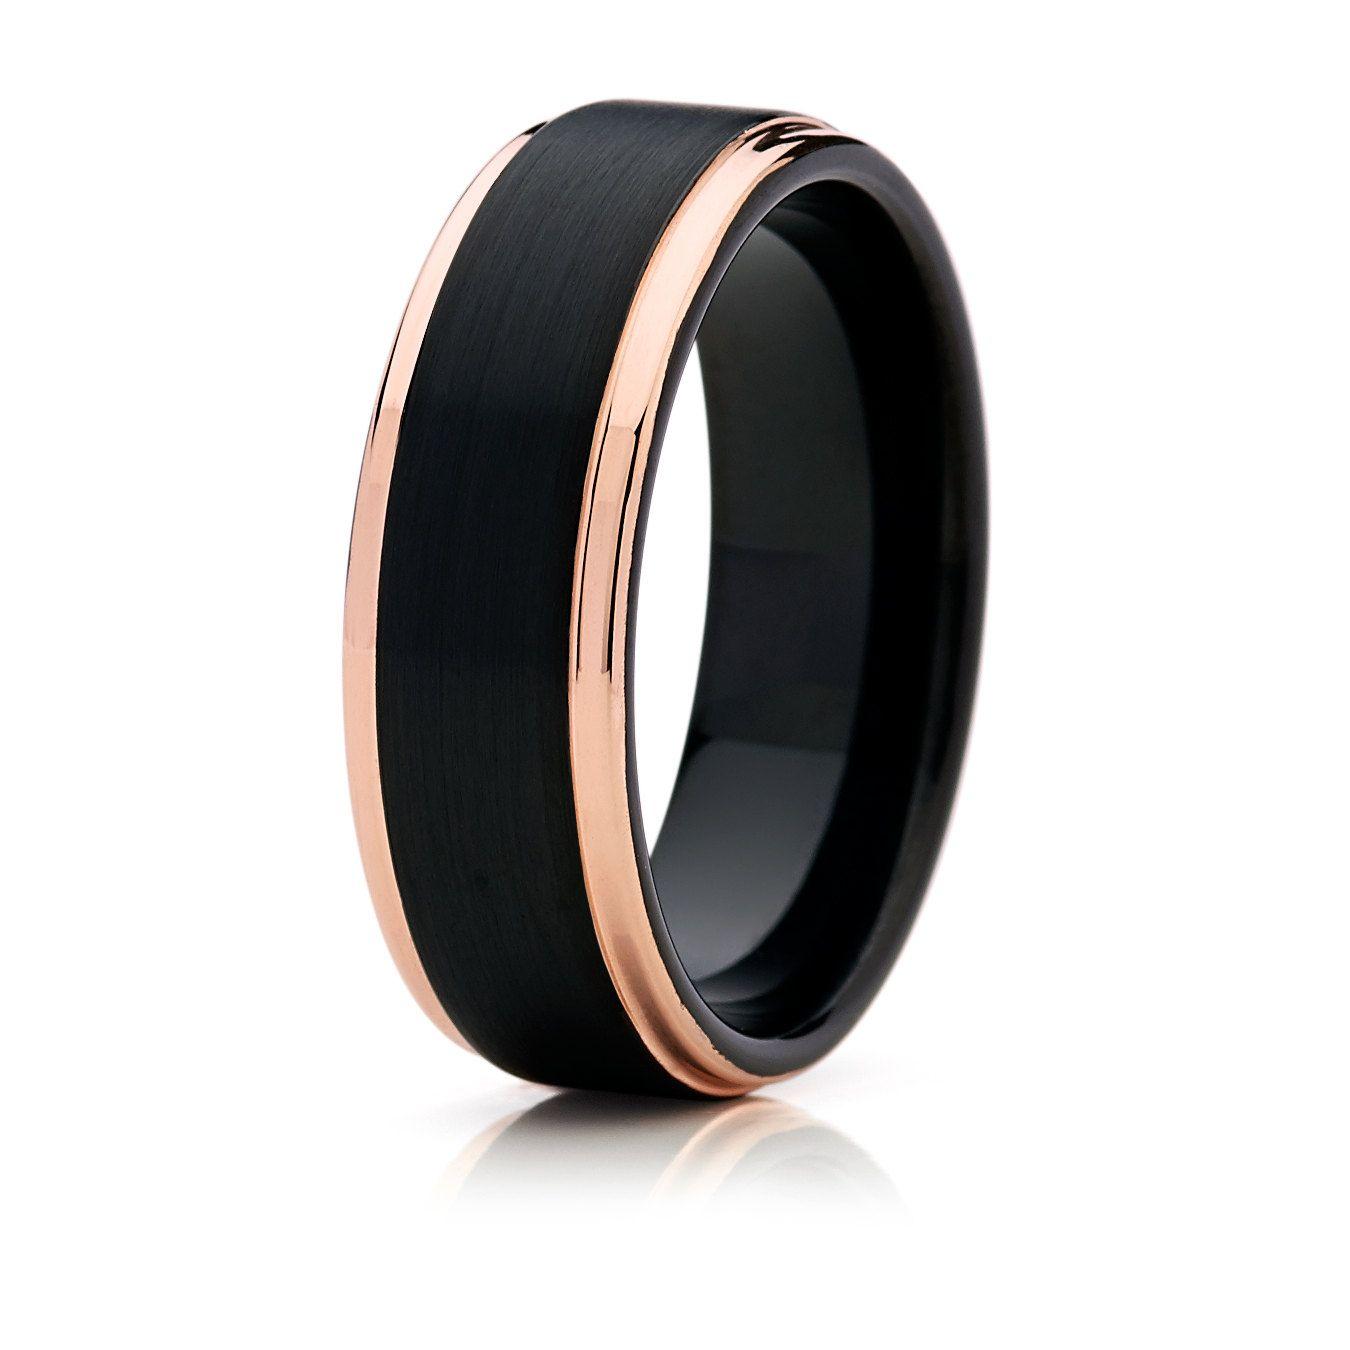 mens black wedding rings Black with Rose Gold Tungsten Mens Wedding BandTungsten Wedding BandTungsten Wedding RingTungsten Unisex Band Anniversary Ring